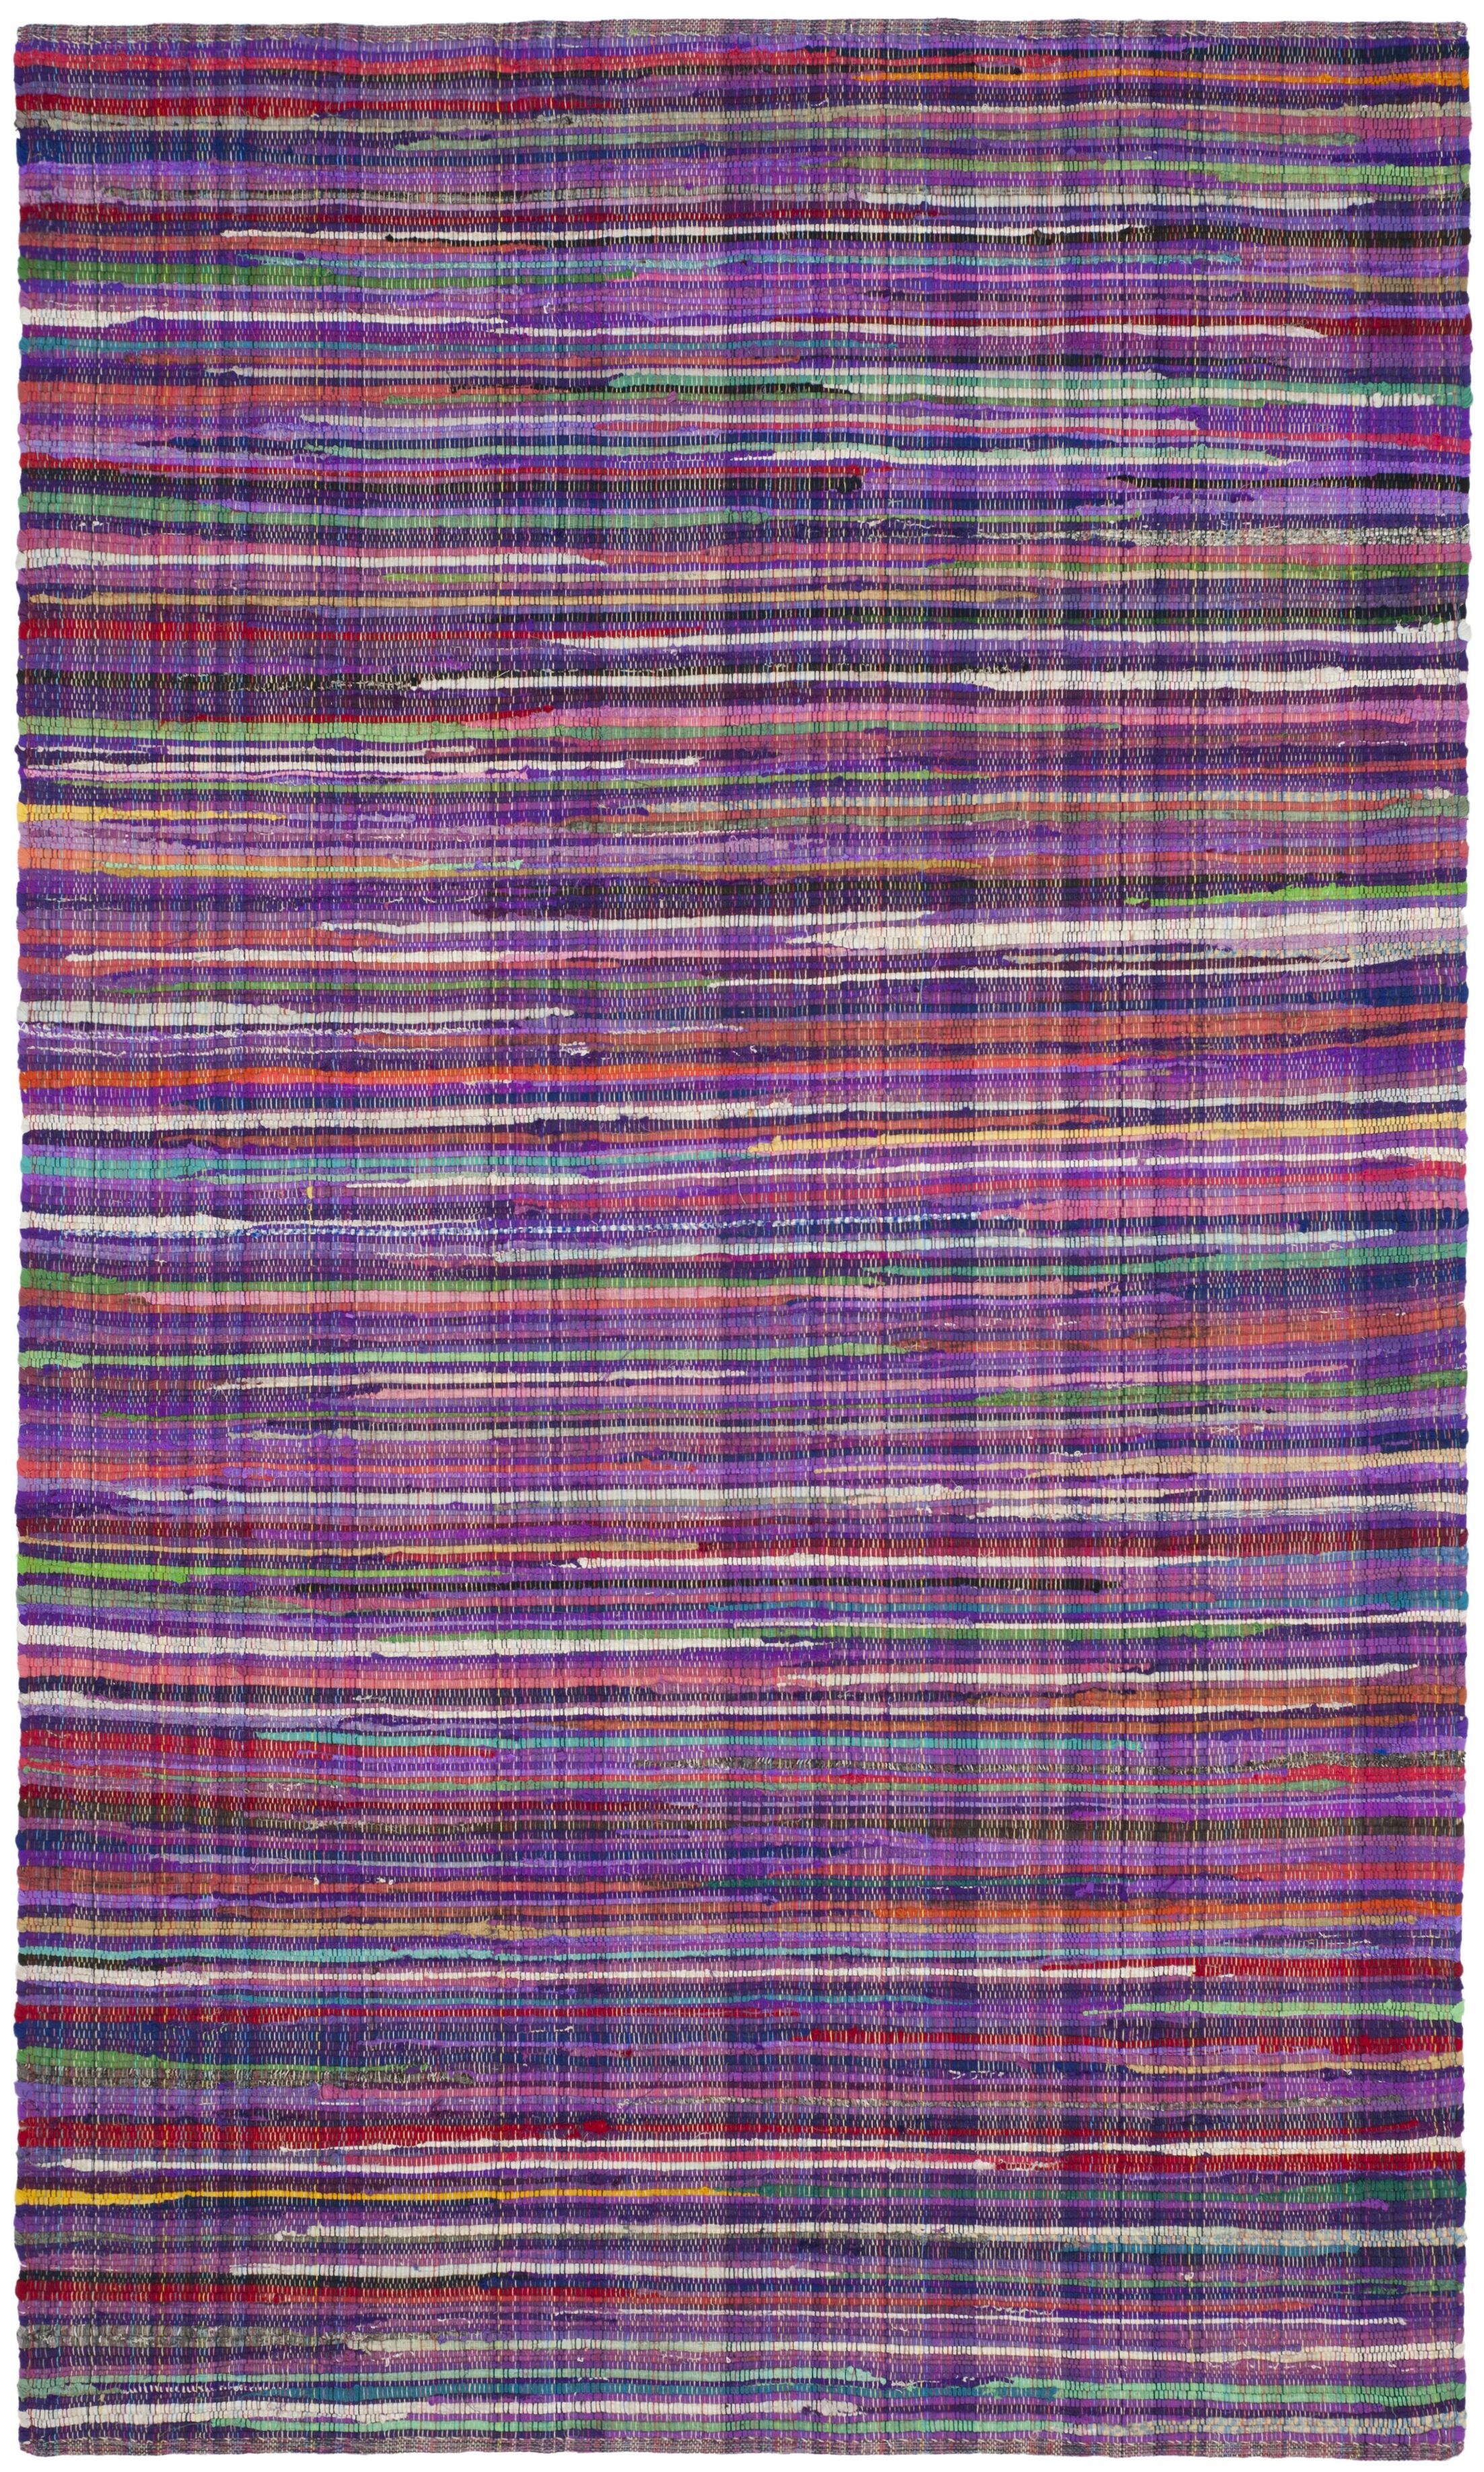 Shatzer Hand-Woven Purple Area Rug Rug Size: Rectangle 6' x 9'